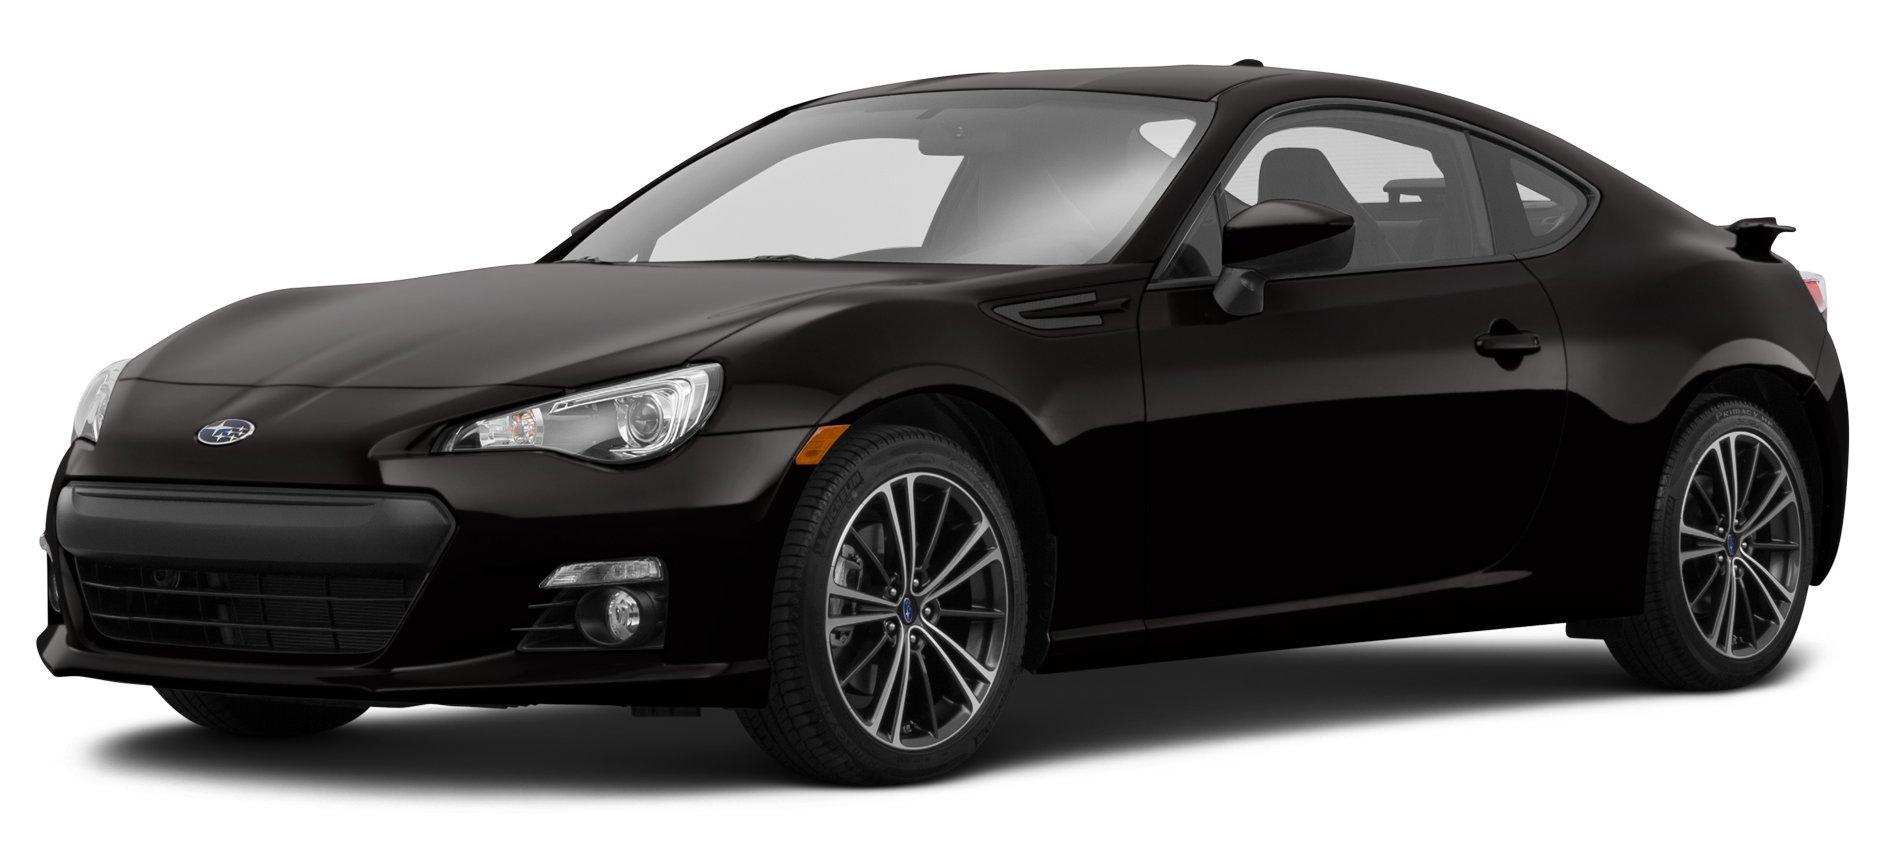 2016 subaru brz limited 2 door coupe automatic transmission